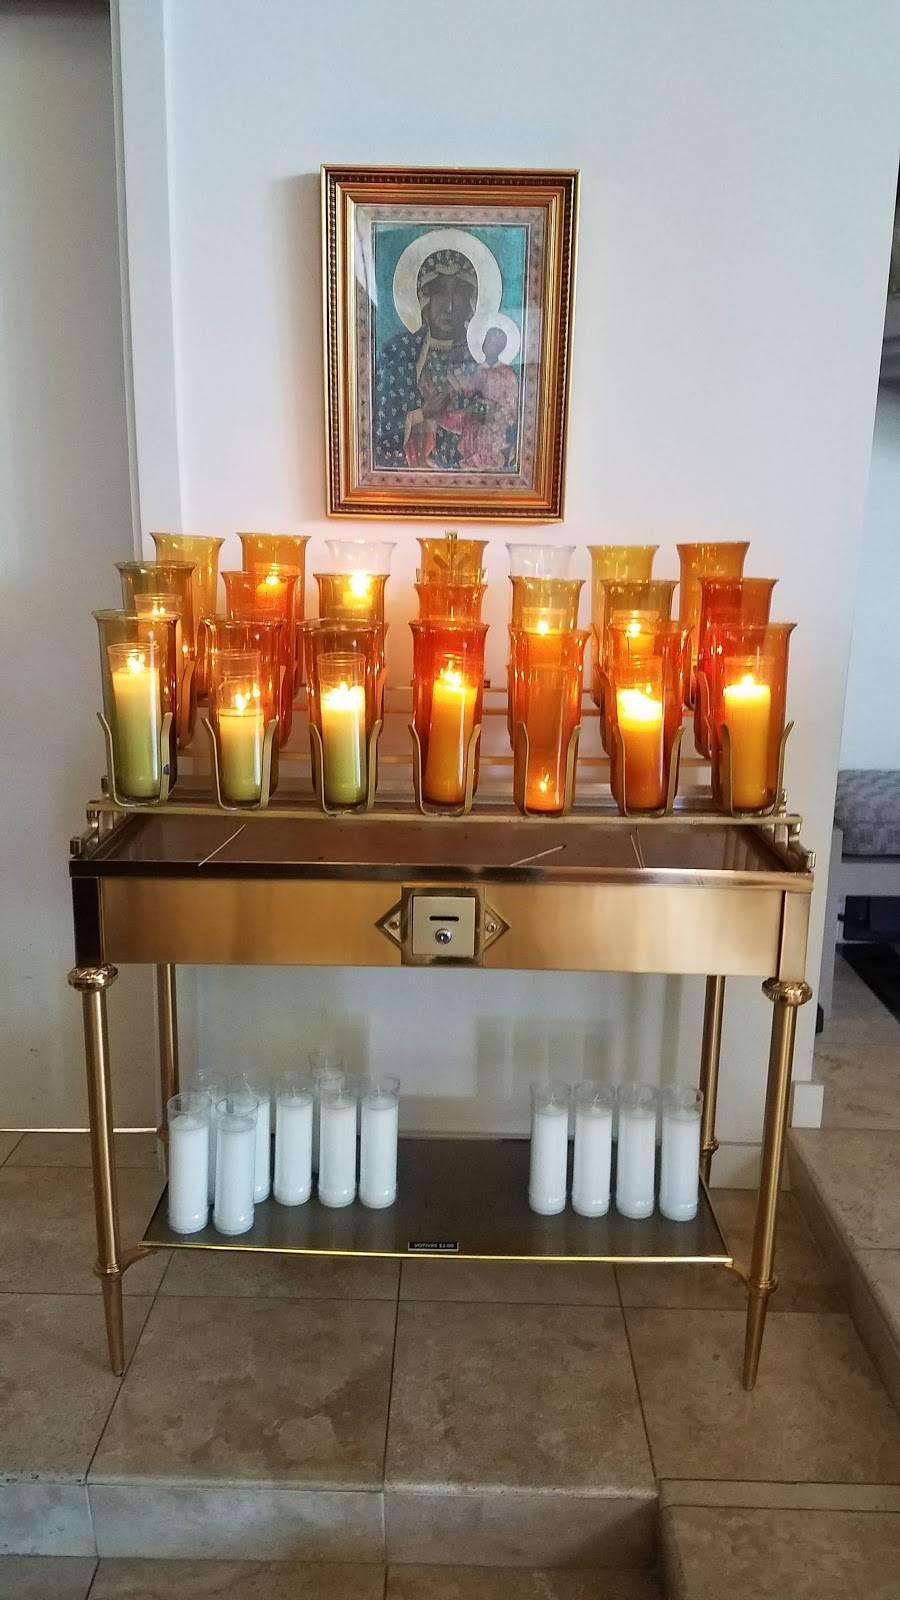 St. Monica Catholic Church - church  | Photo 3 of 8 | Address: 4311 88th Ave SE, Mercer Island, WA 98040, USA | Phone: (206) 232-2900